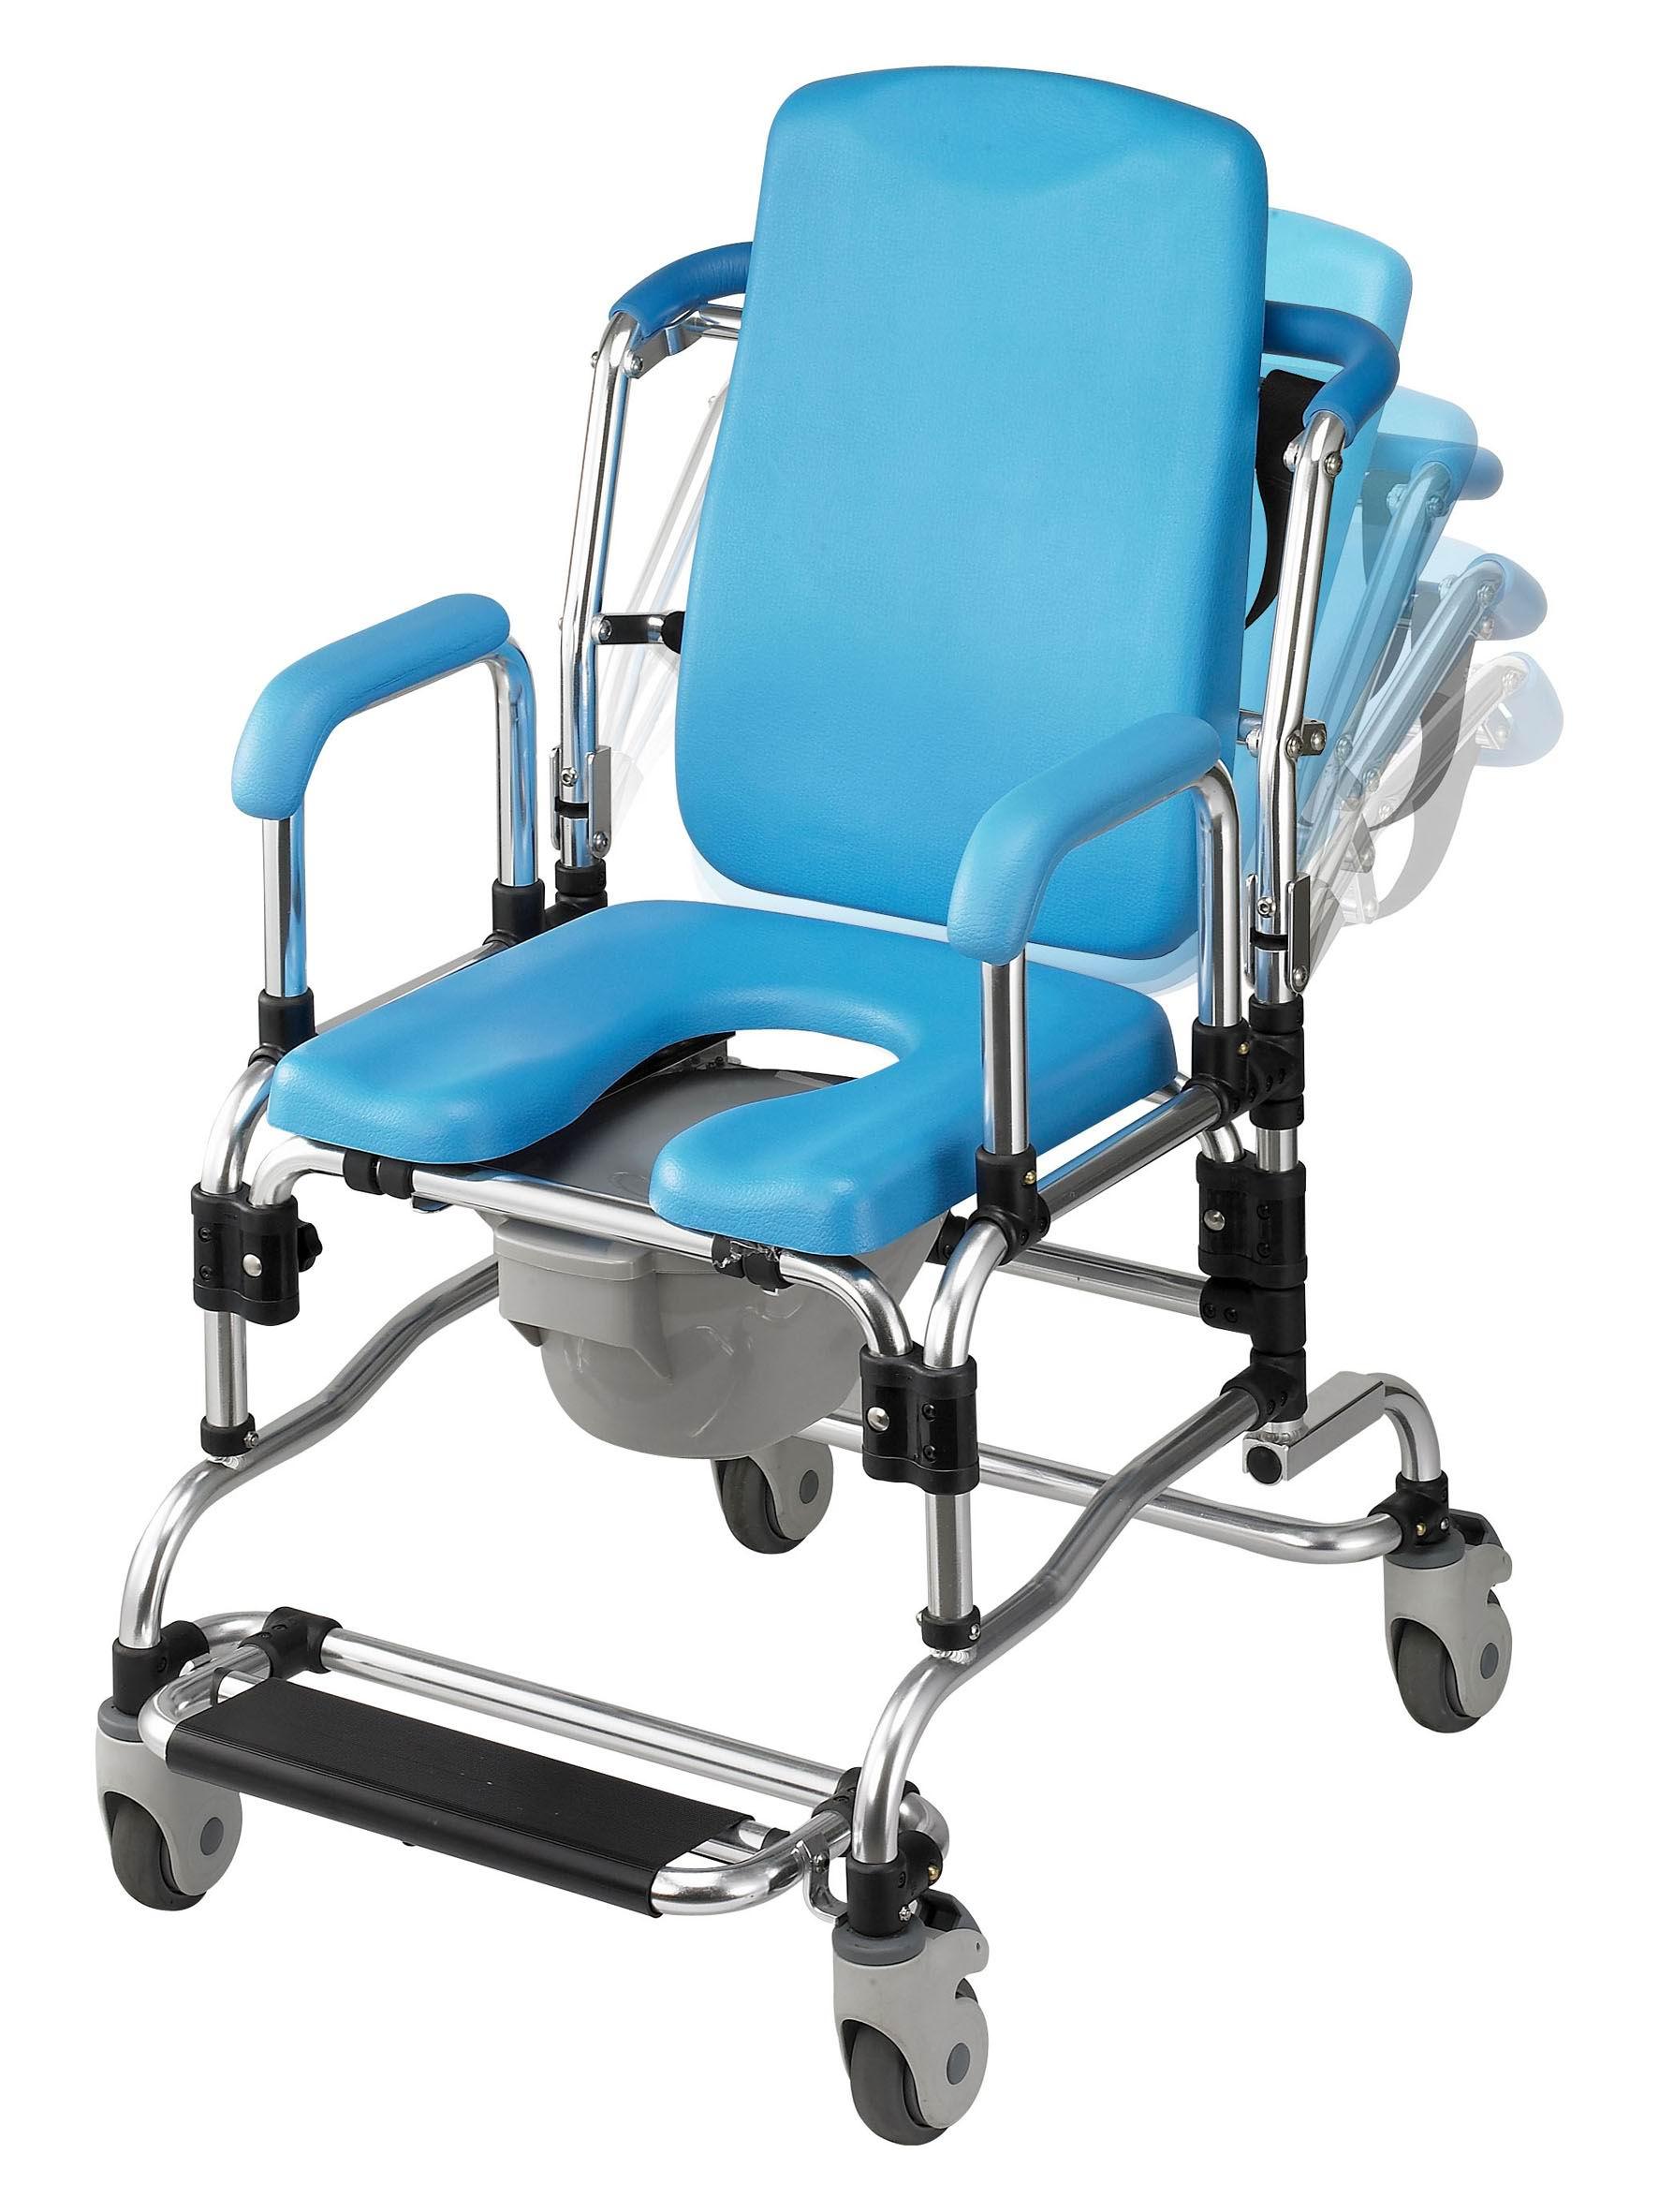 Wondrous Details About Laguna Reclining Bath Shower Chair With Padded Seat Back Armrests Headrest Creativecarmelina Interior Chair Design Creativecarmelinacom